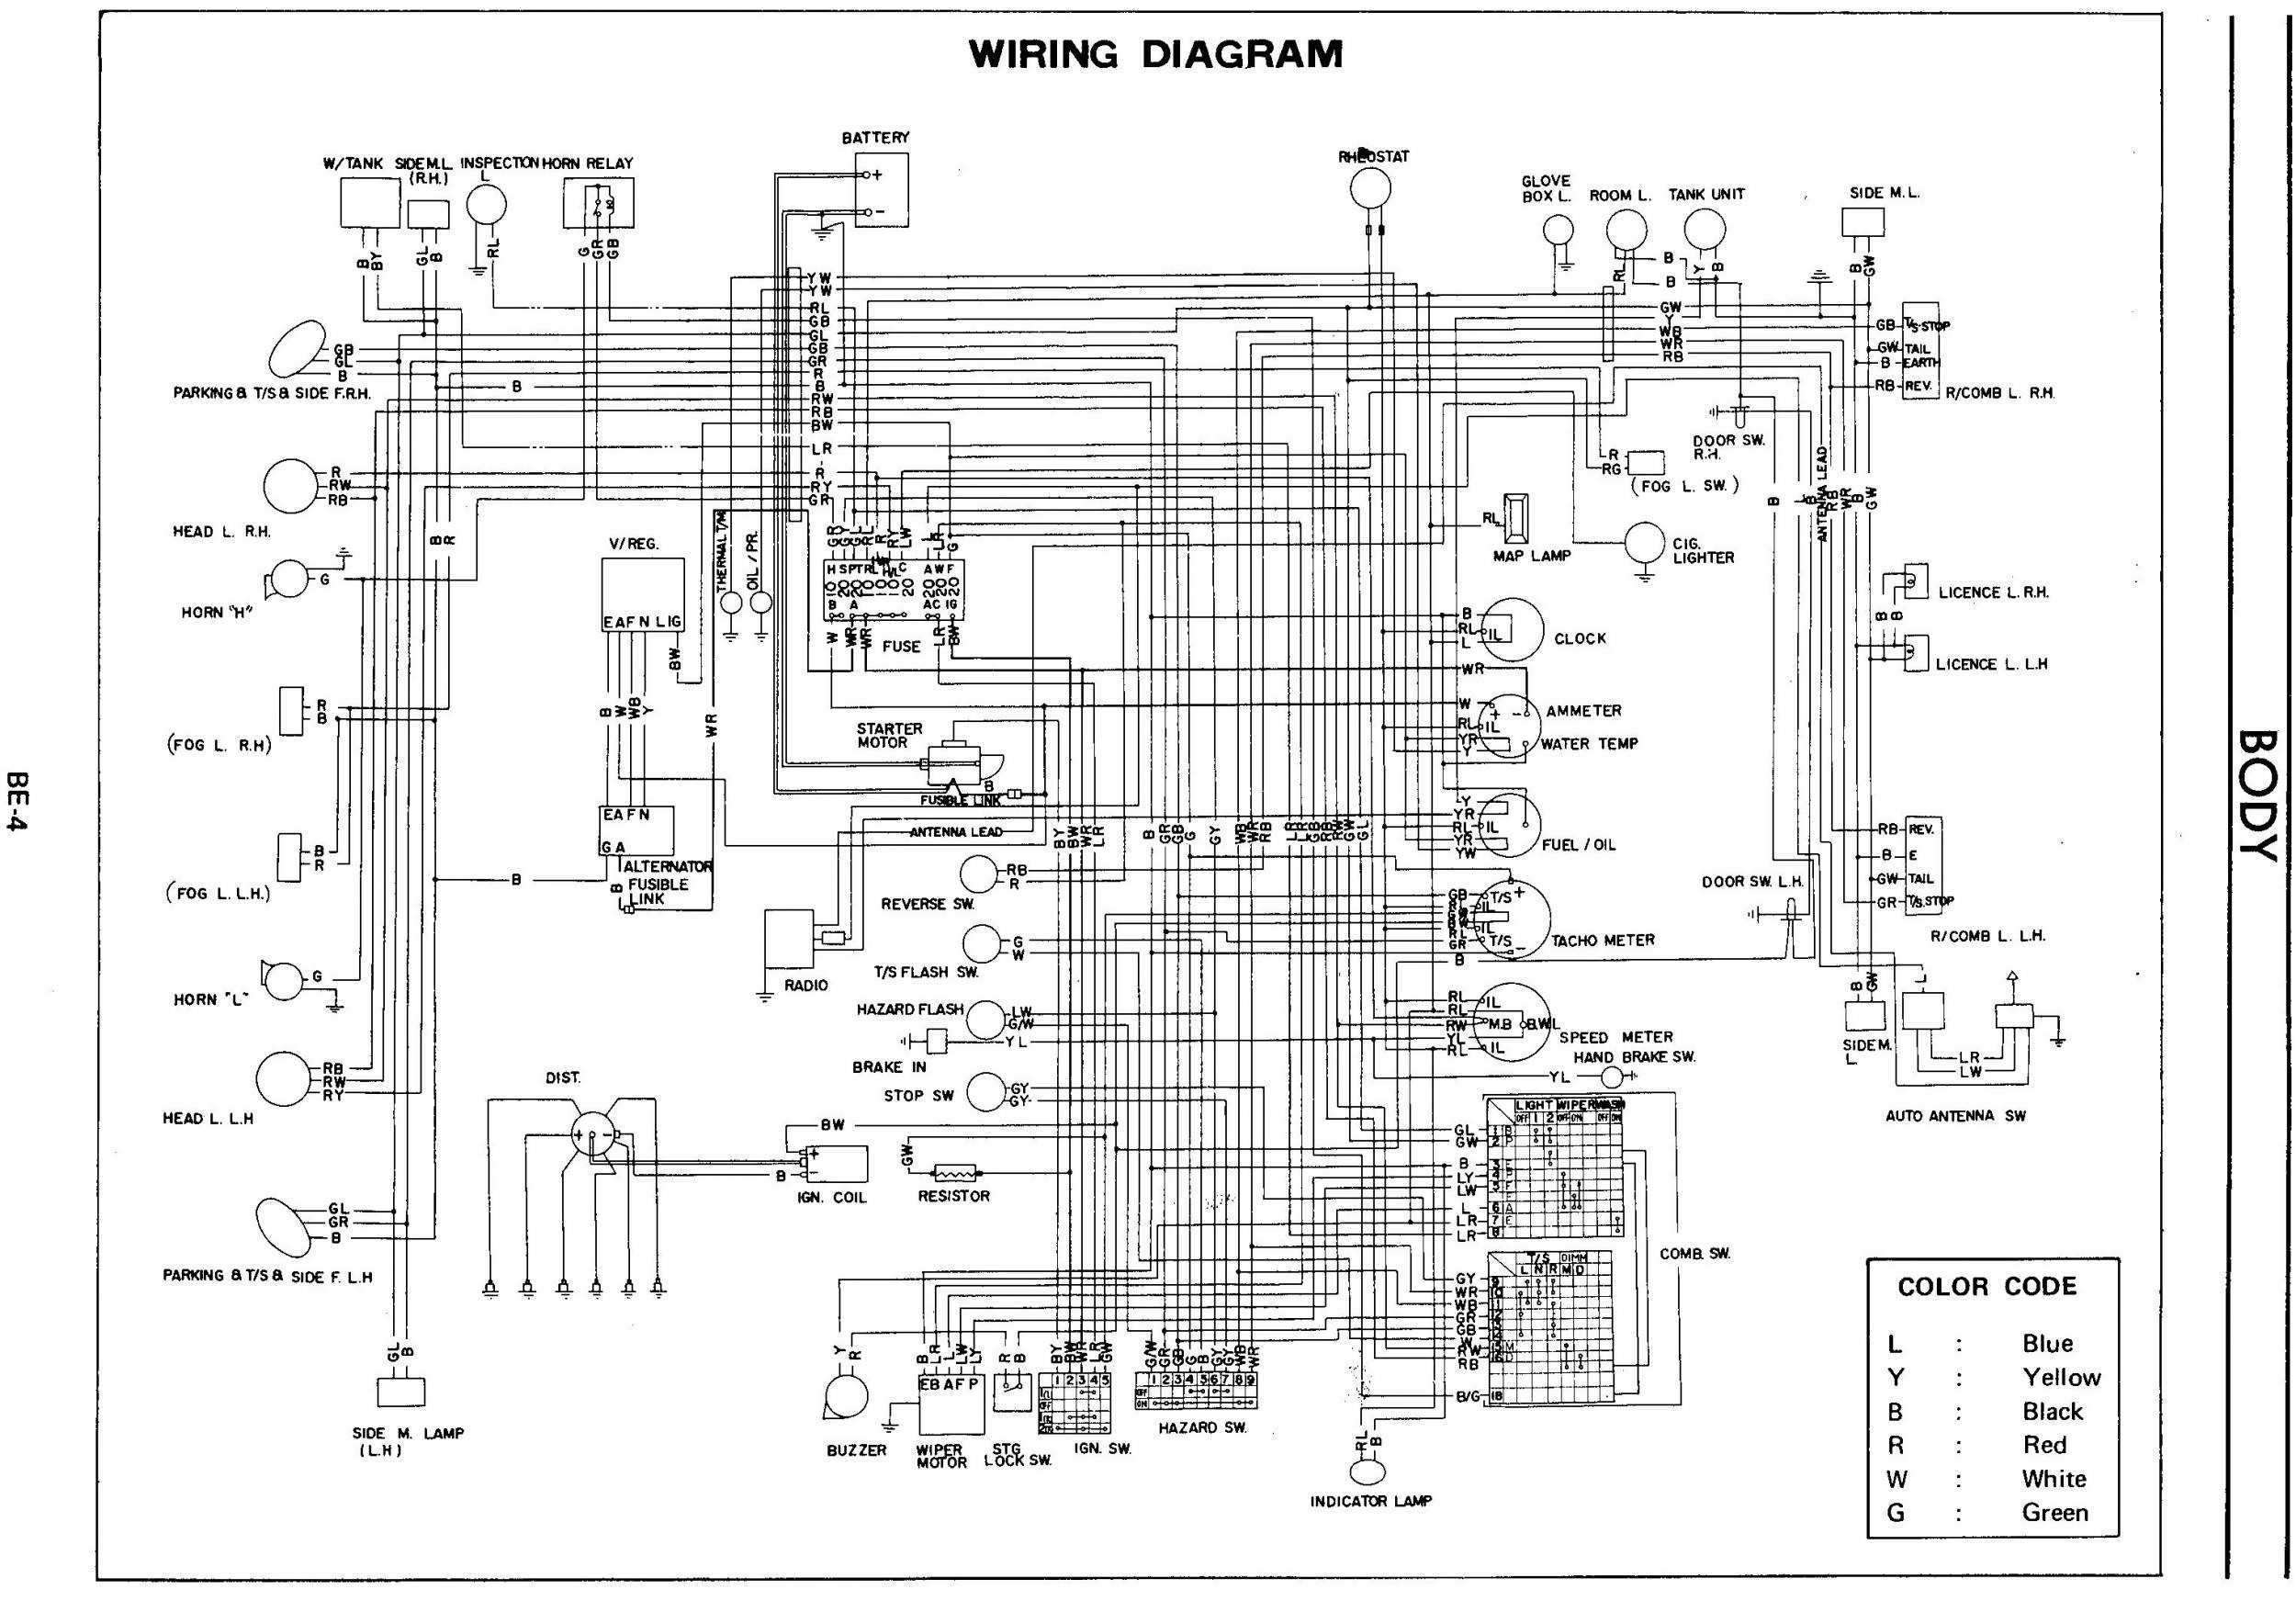 mercedes benz sprinter wiring diagram coleman gas furnace pdf sample